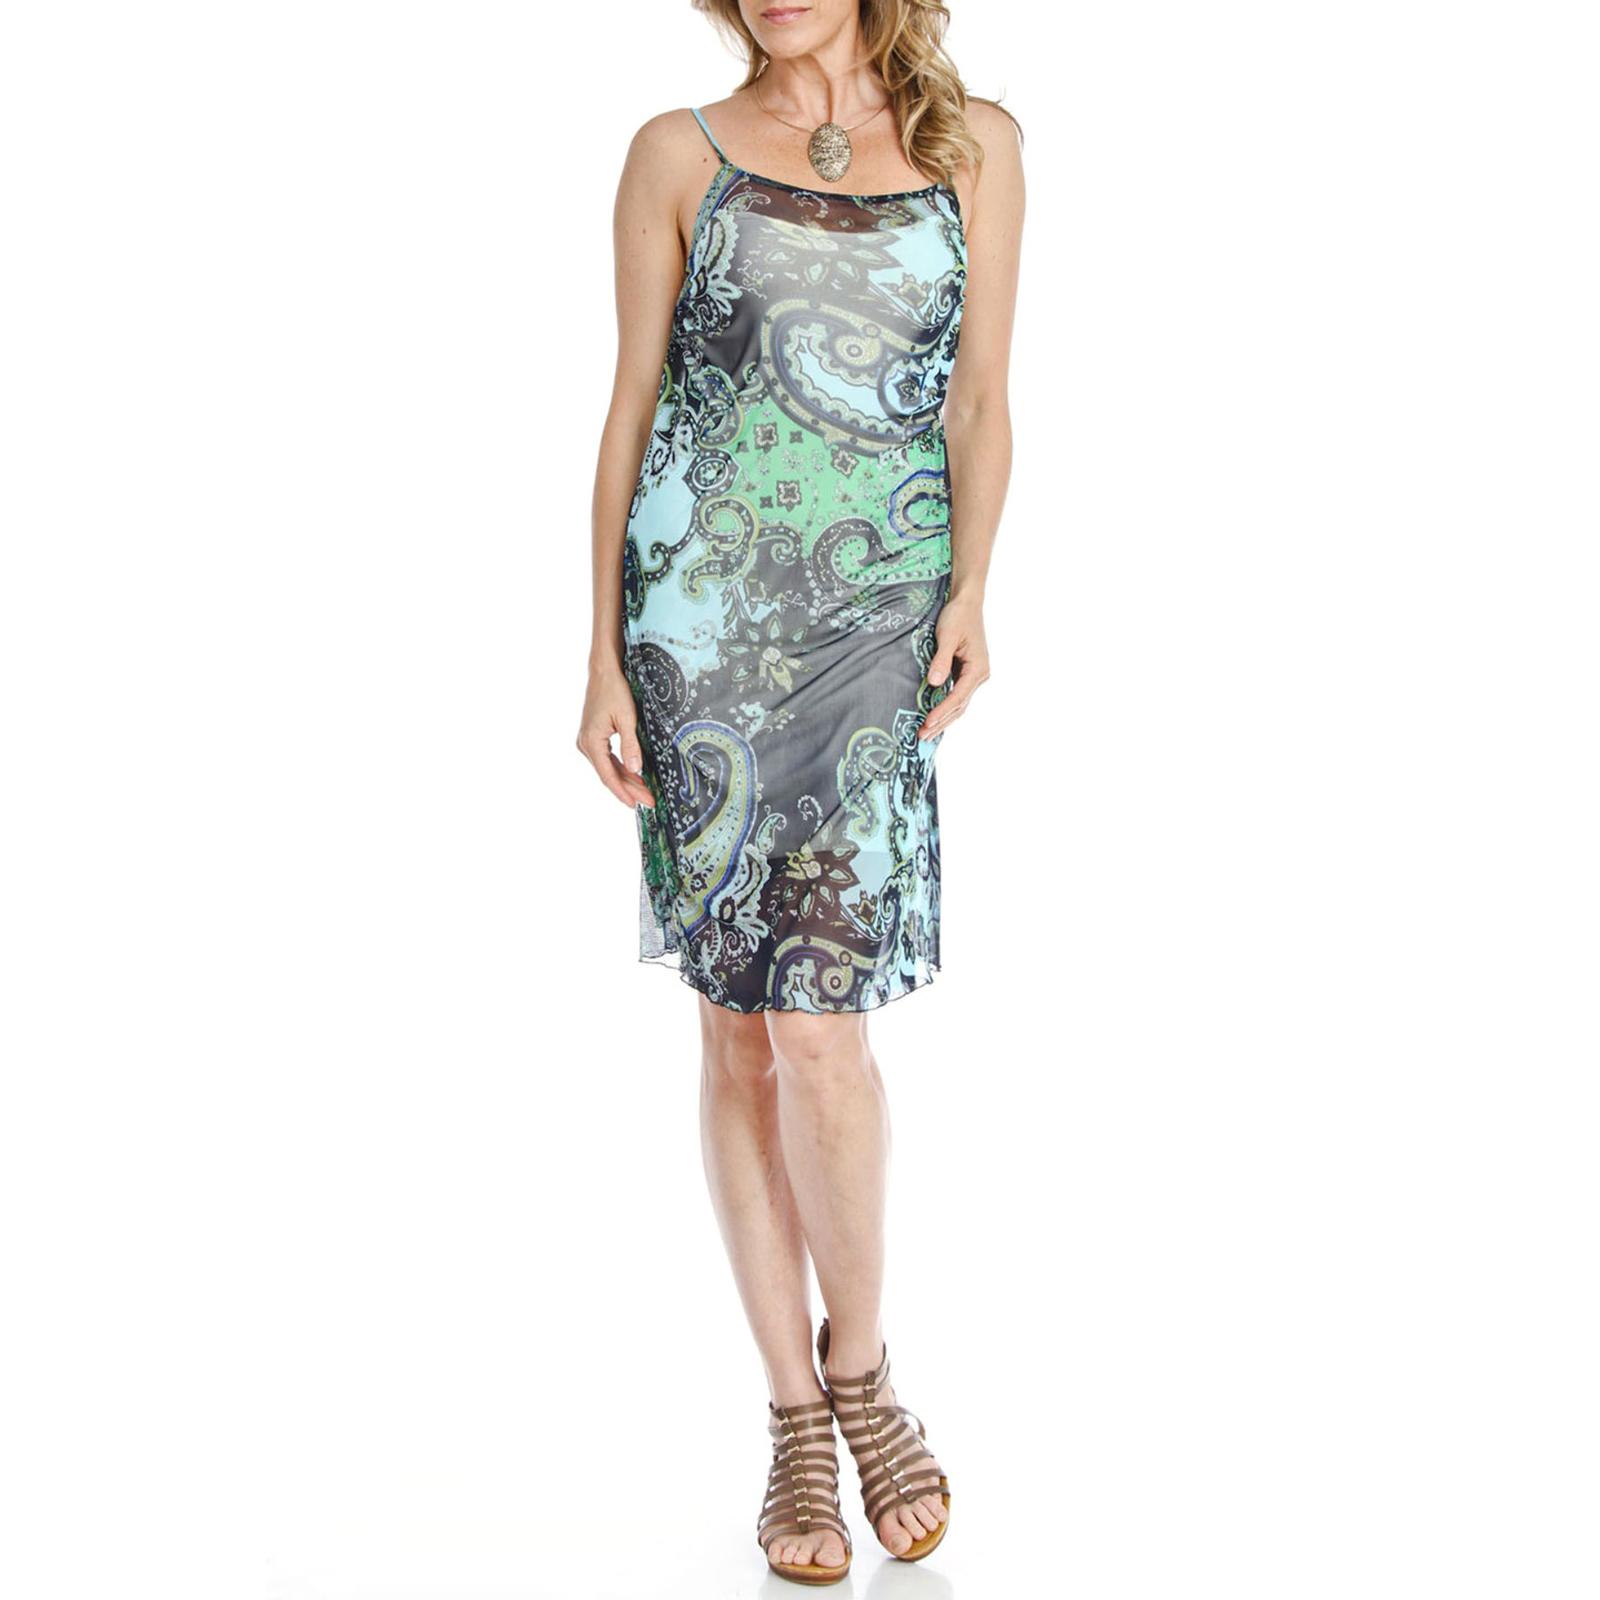 BLUE PLATE FASHION Women's Boho Blue & Green Sleeveless Strap Short Mesh Dress